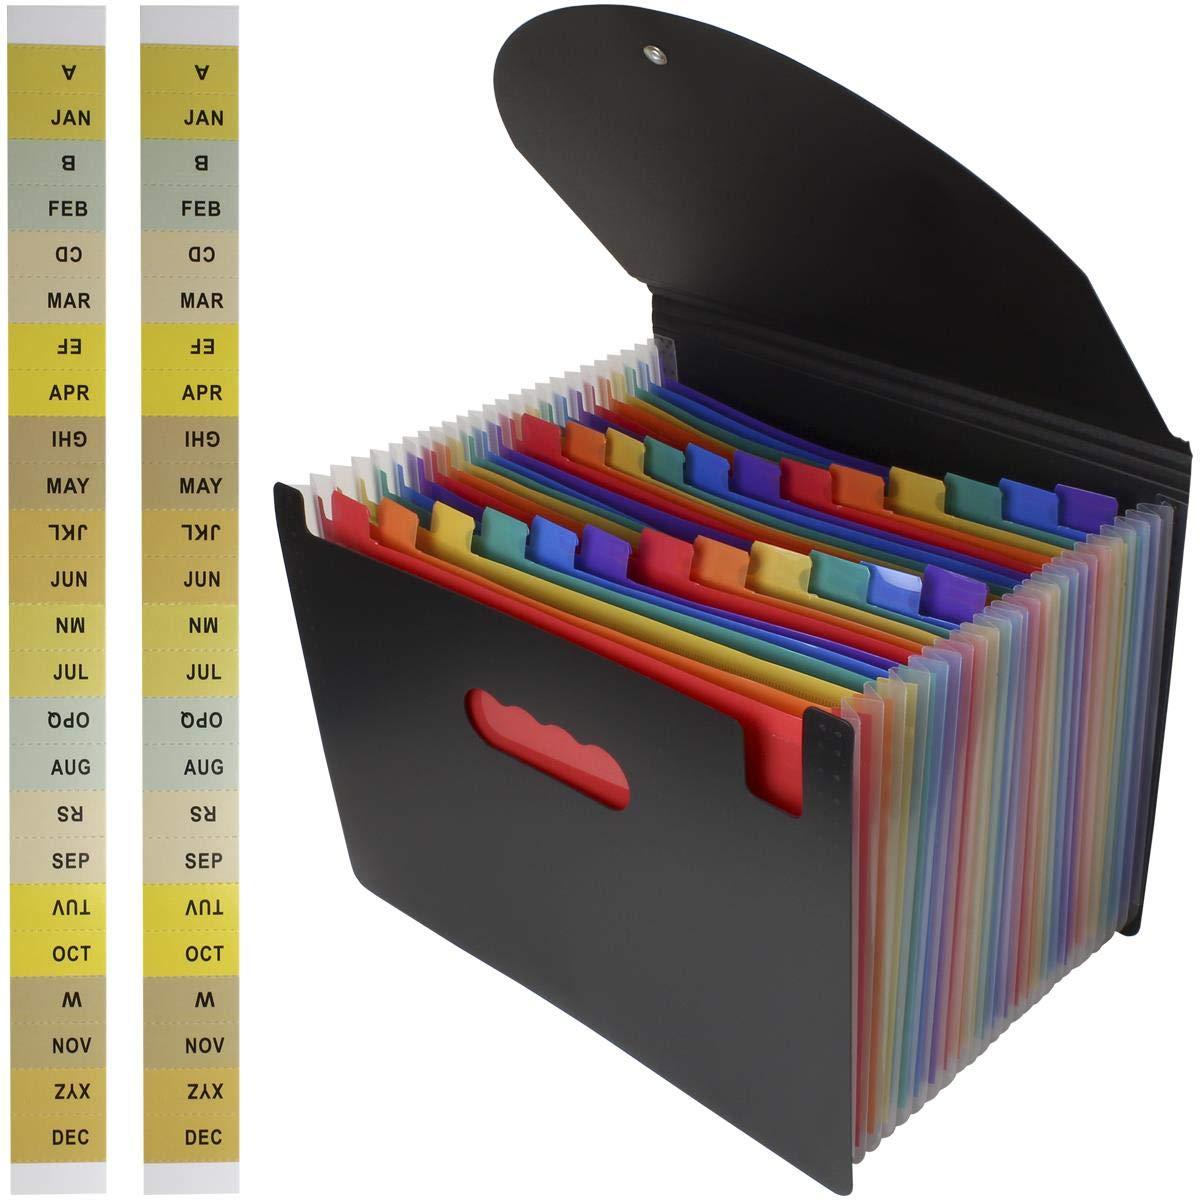 25 Bolsillos Negro iGadgitz Home U7105 Carpeta Clasificadora Expansible A4 Archivador Acordeon